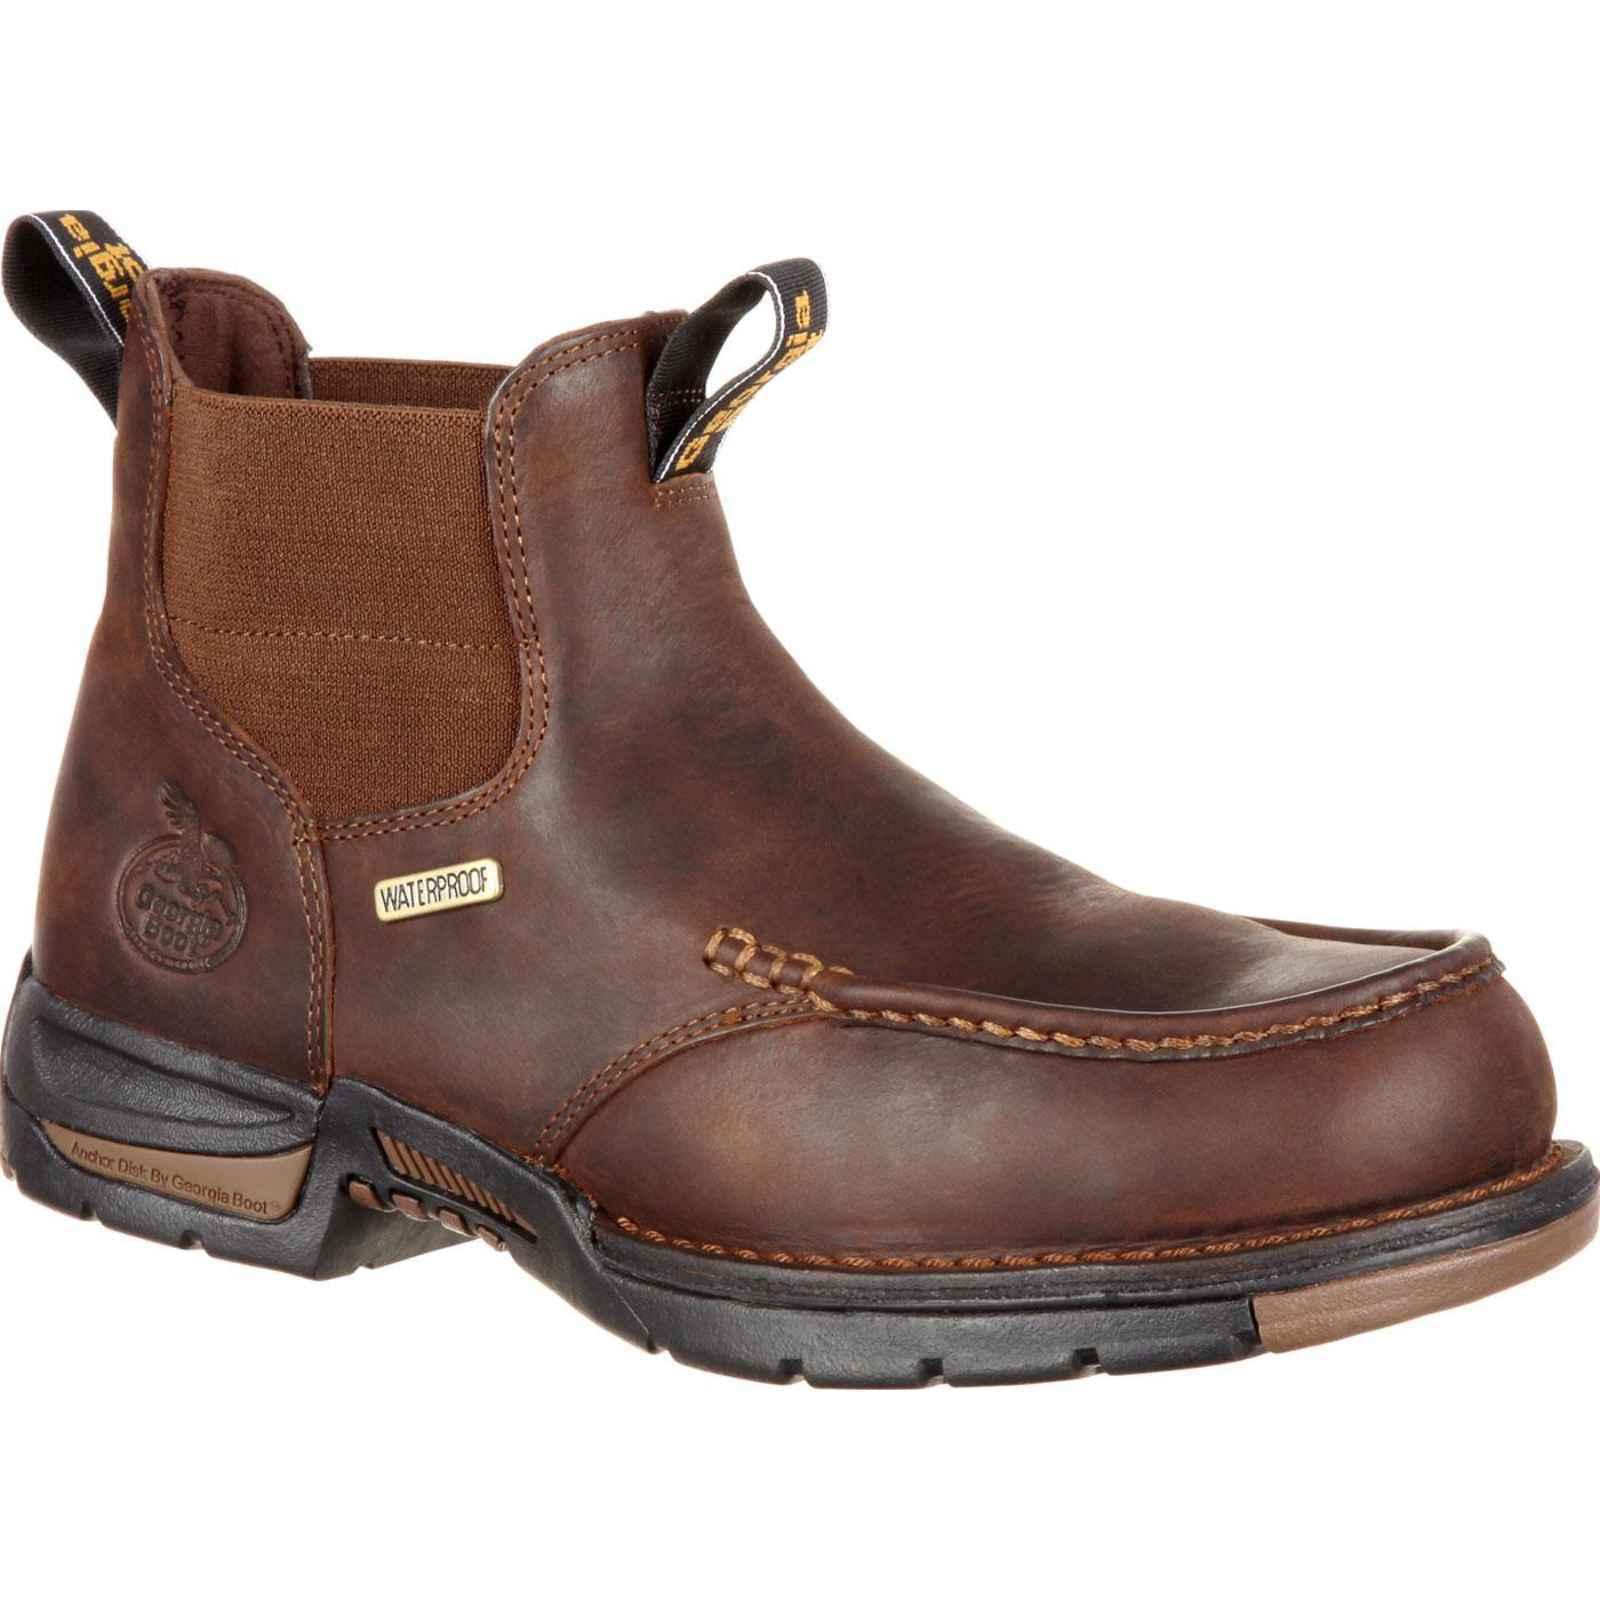 Georgia GB00156 Boot Men's Brown Athens Chelsea Waterproof Work Boot